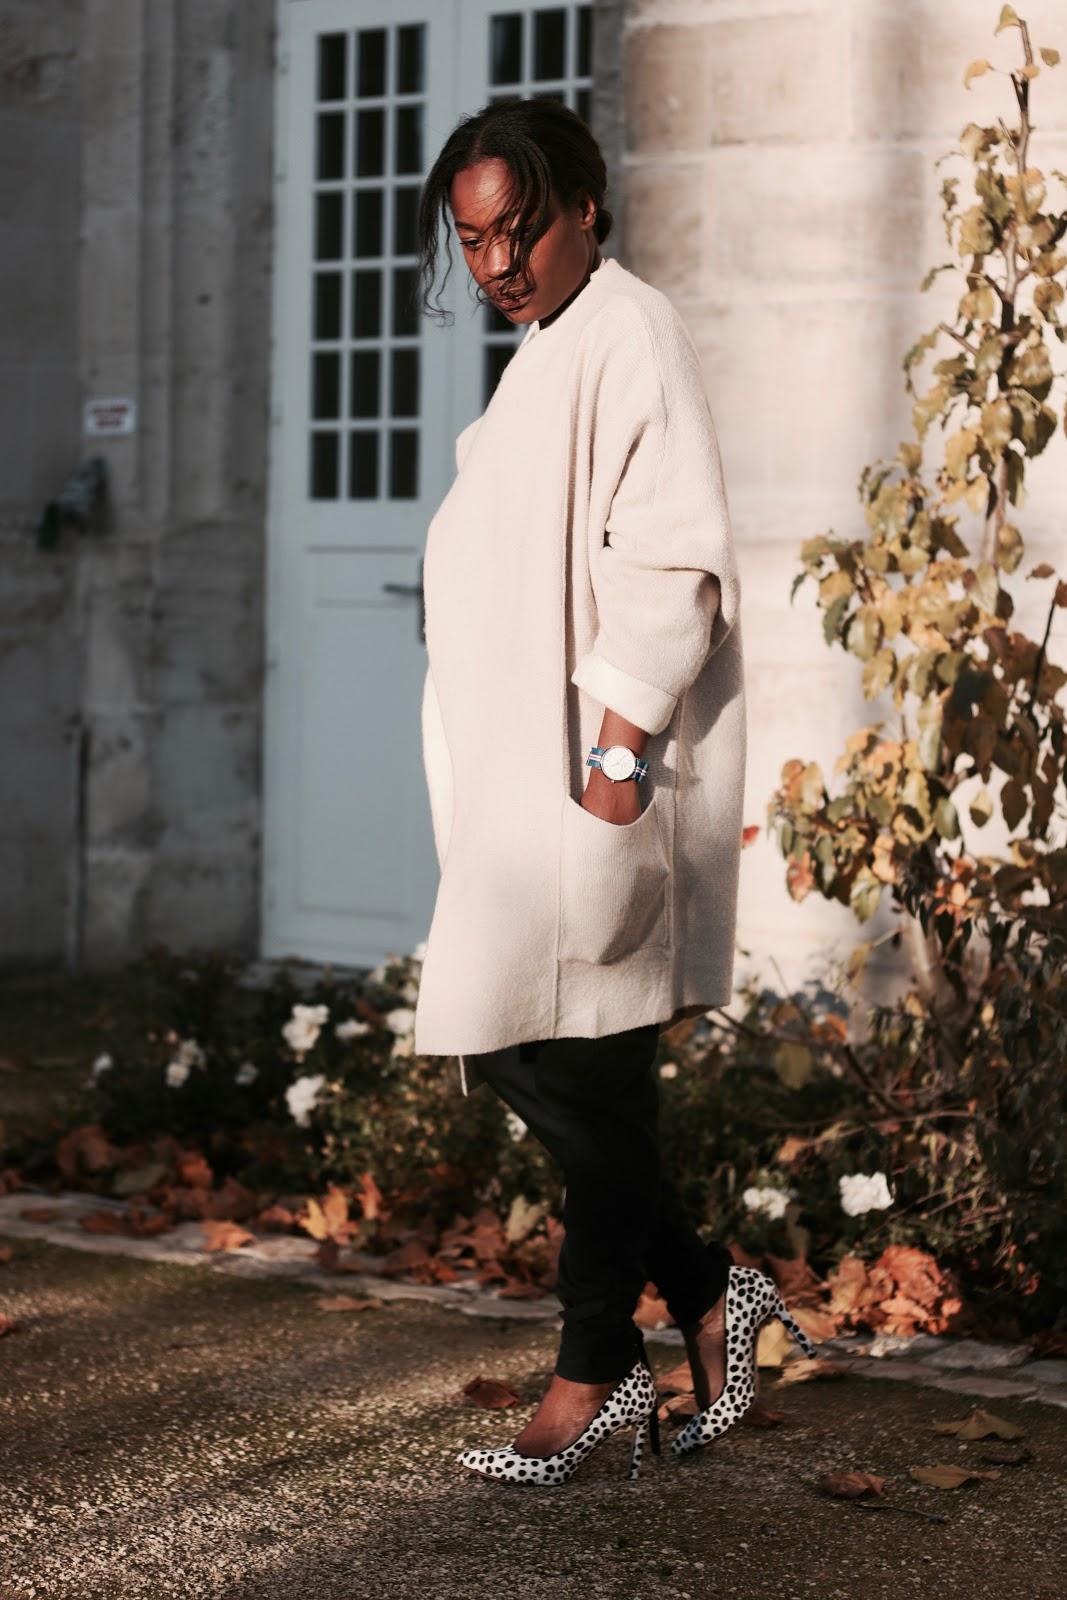 tenue-chic-pour-l'hiver